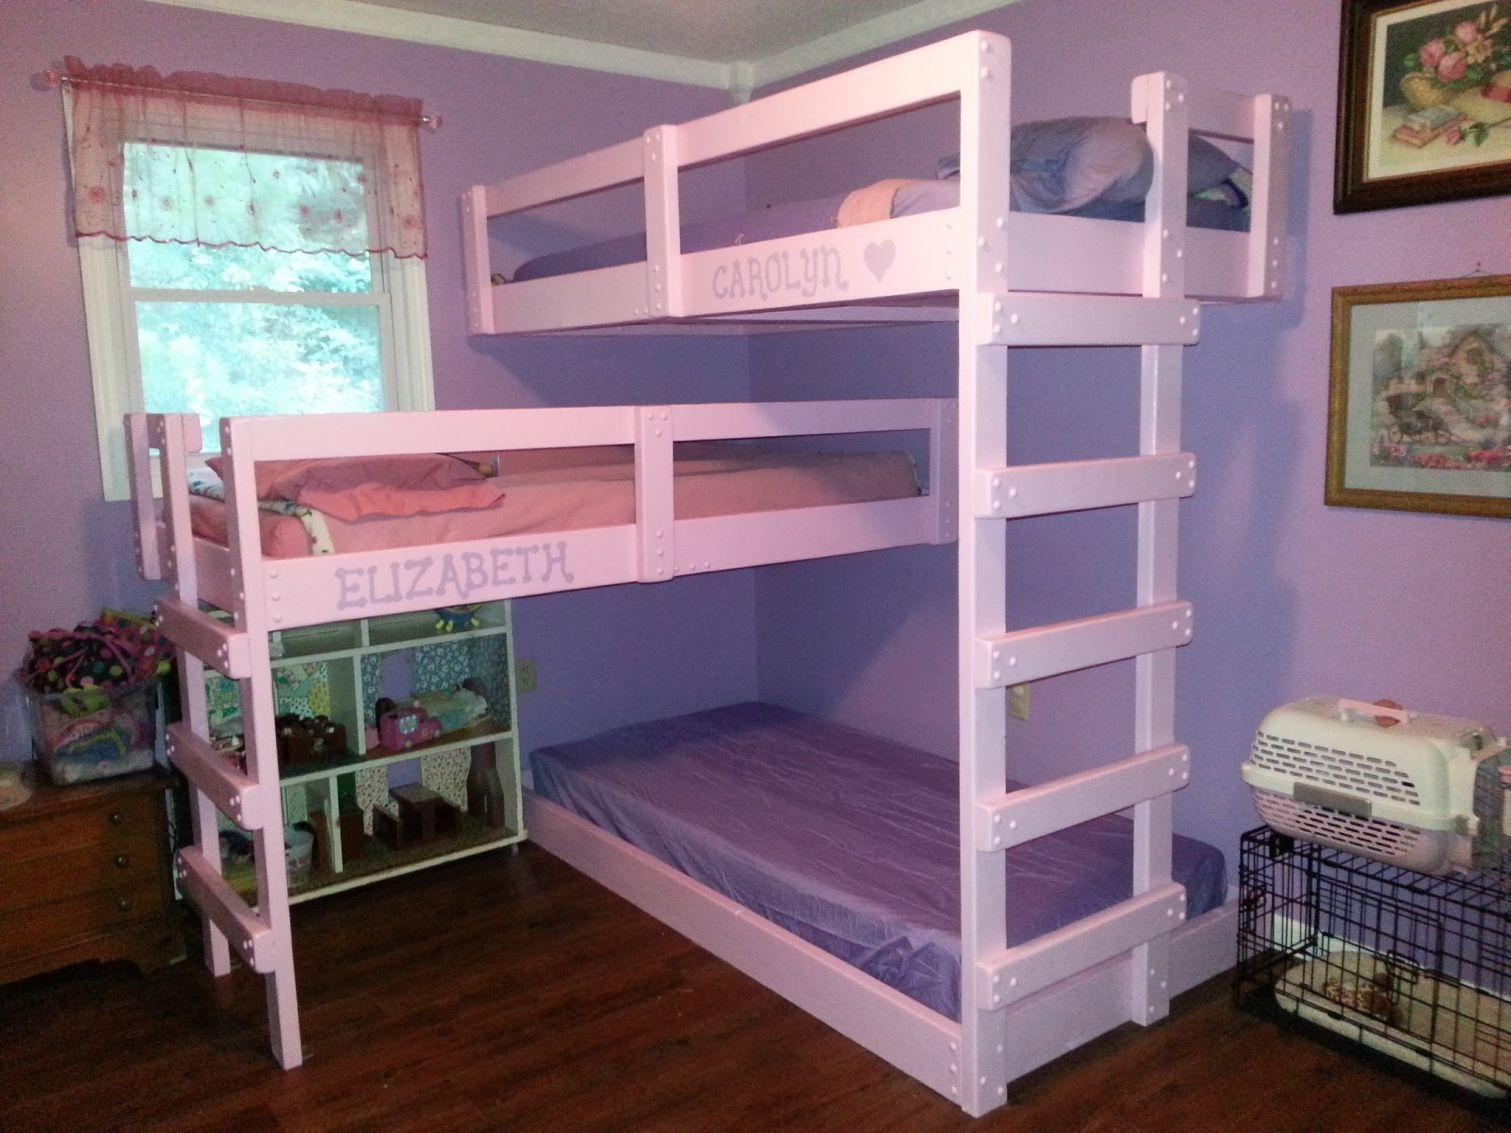 Triple Bunk Beds For Sale Cheap Interior Paint Colors For 2017